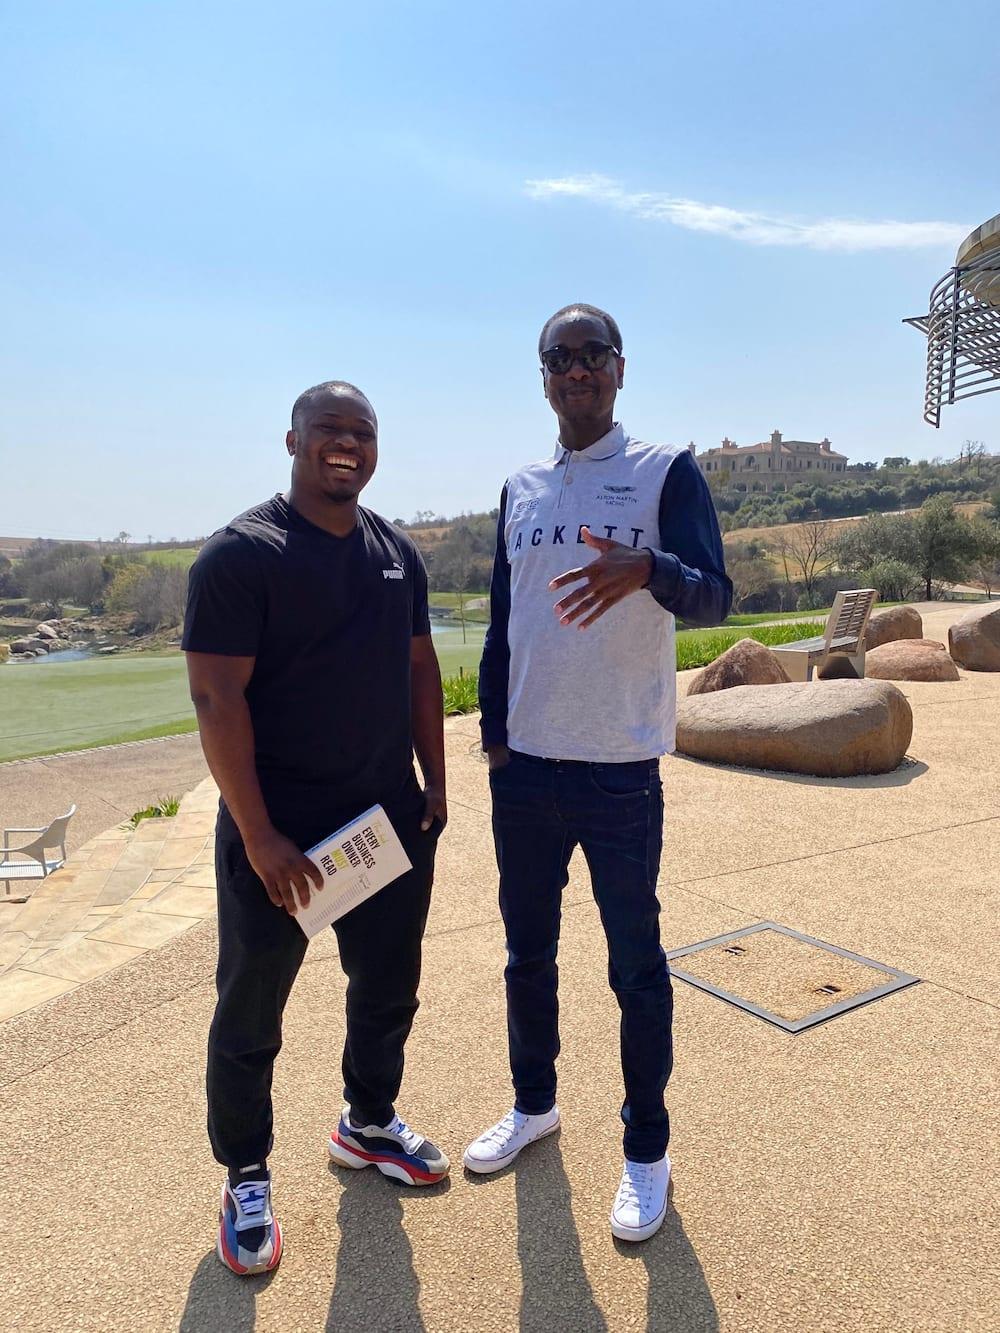 Austin Malema and dineo moeketsi